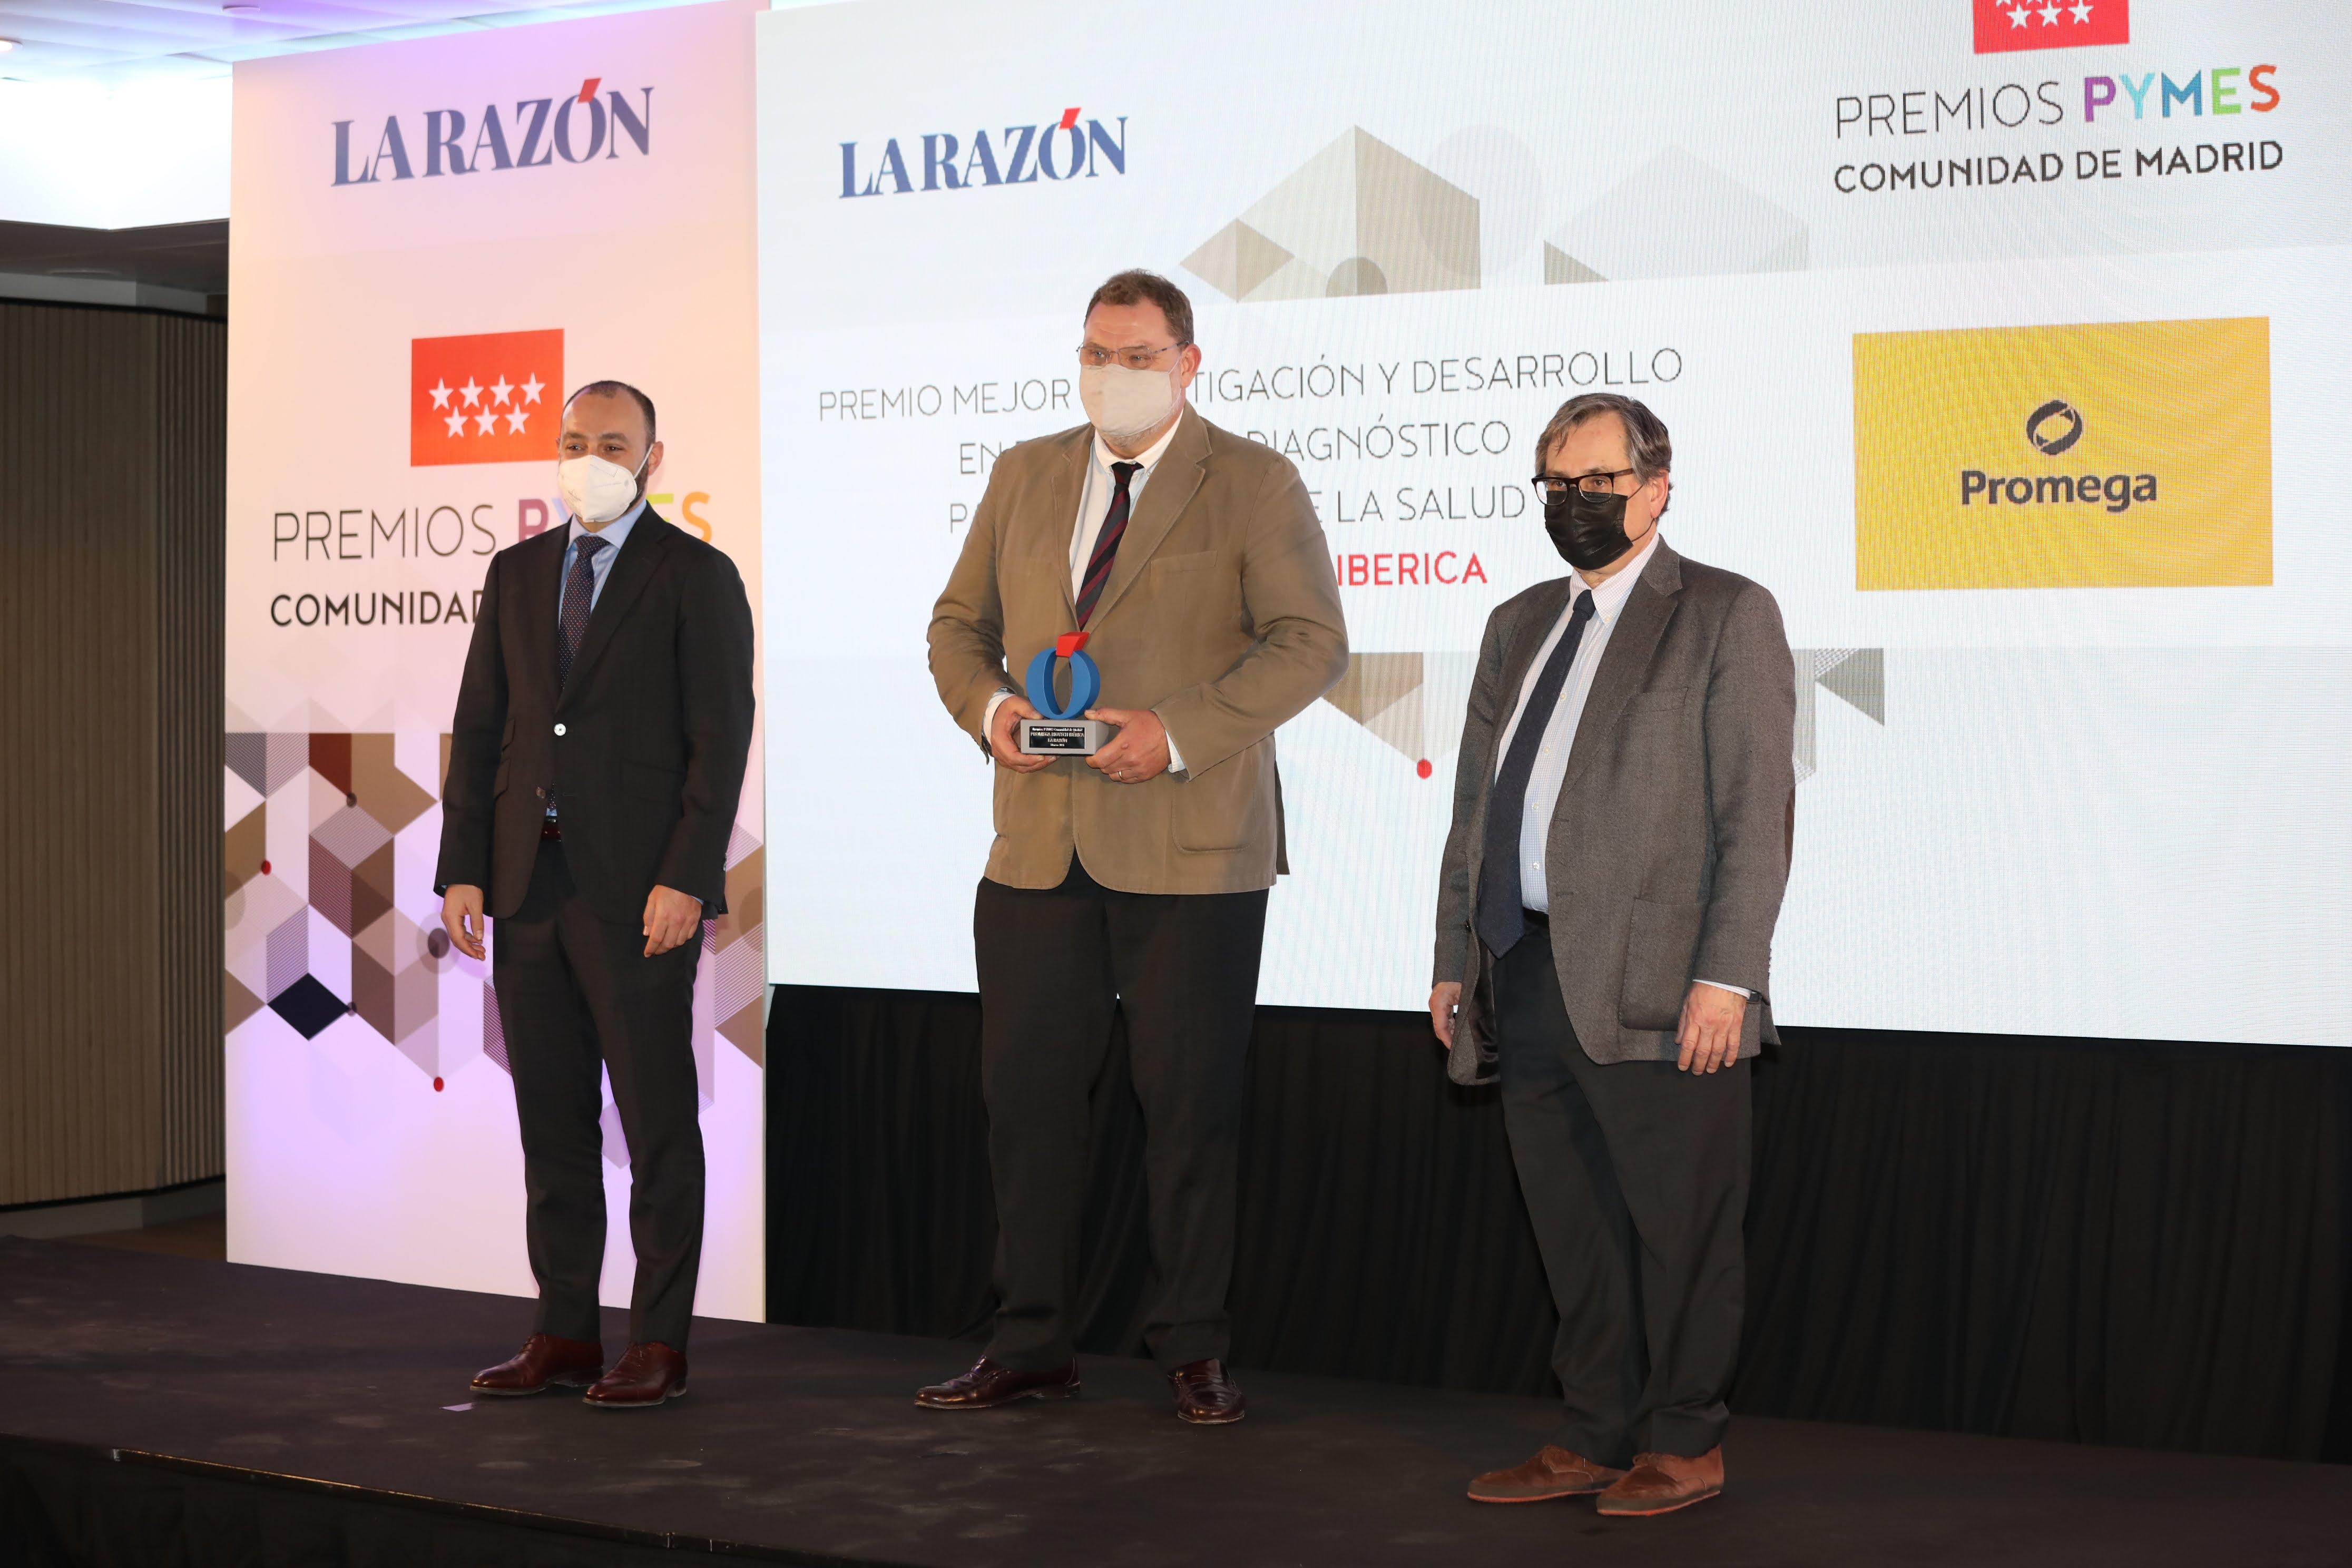 la-razon-award-promega-spain